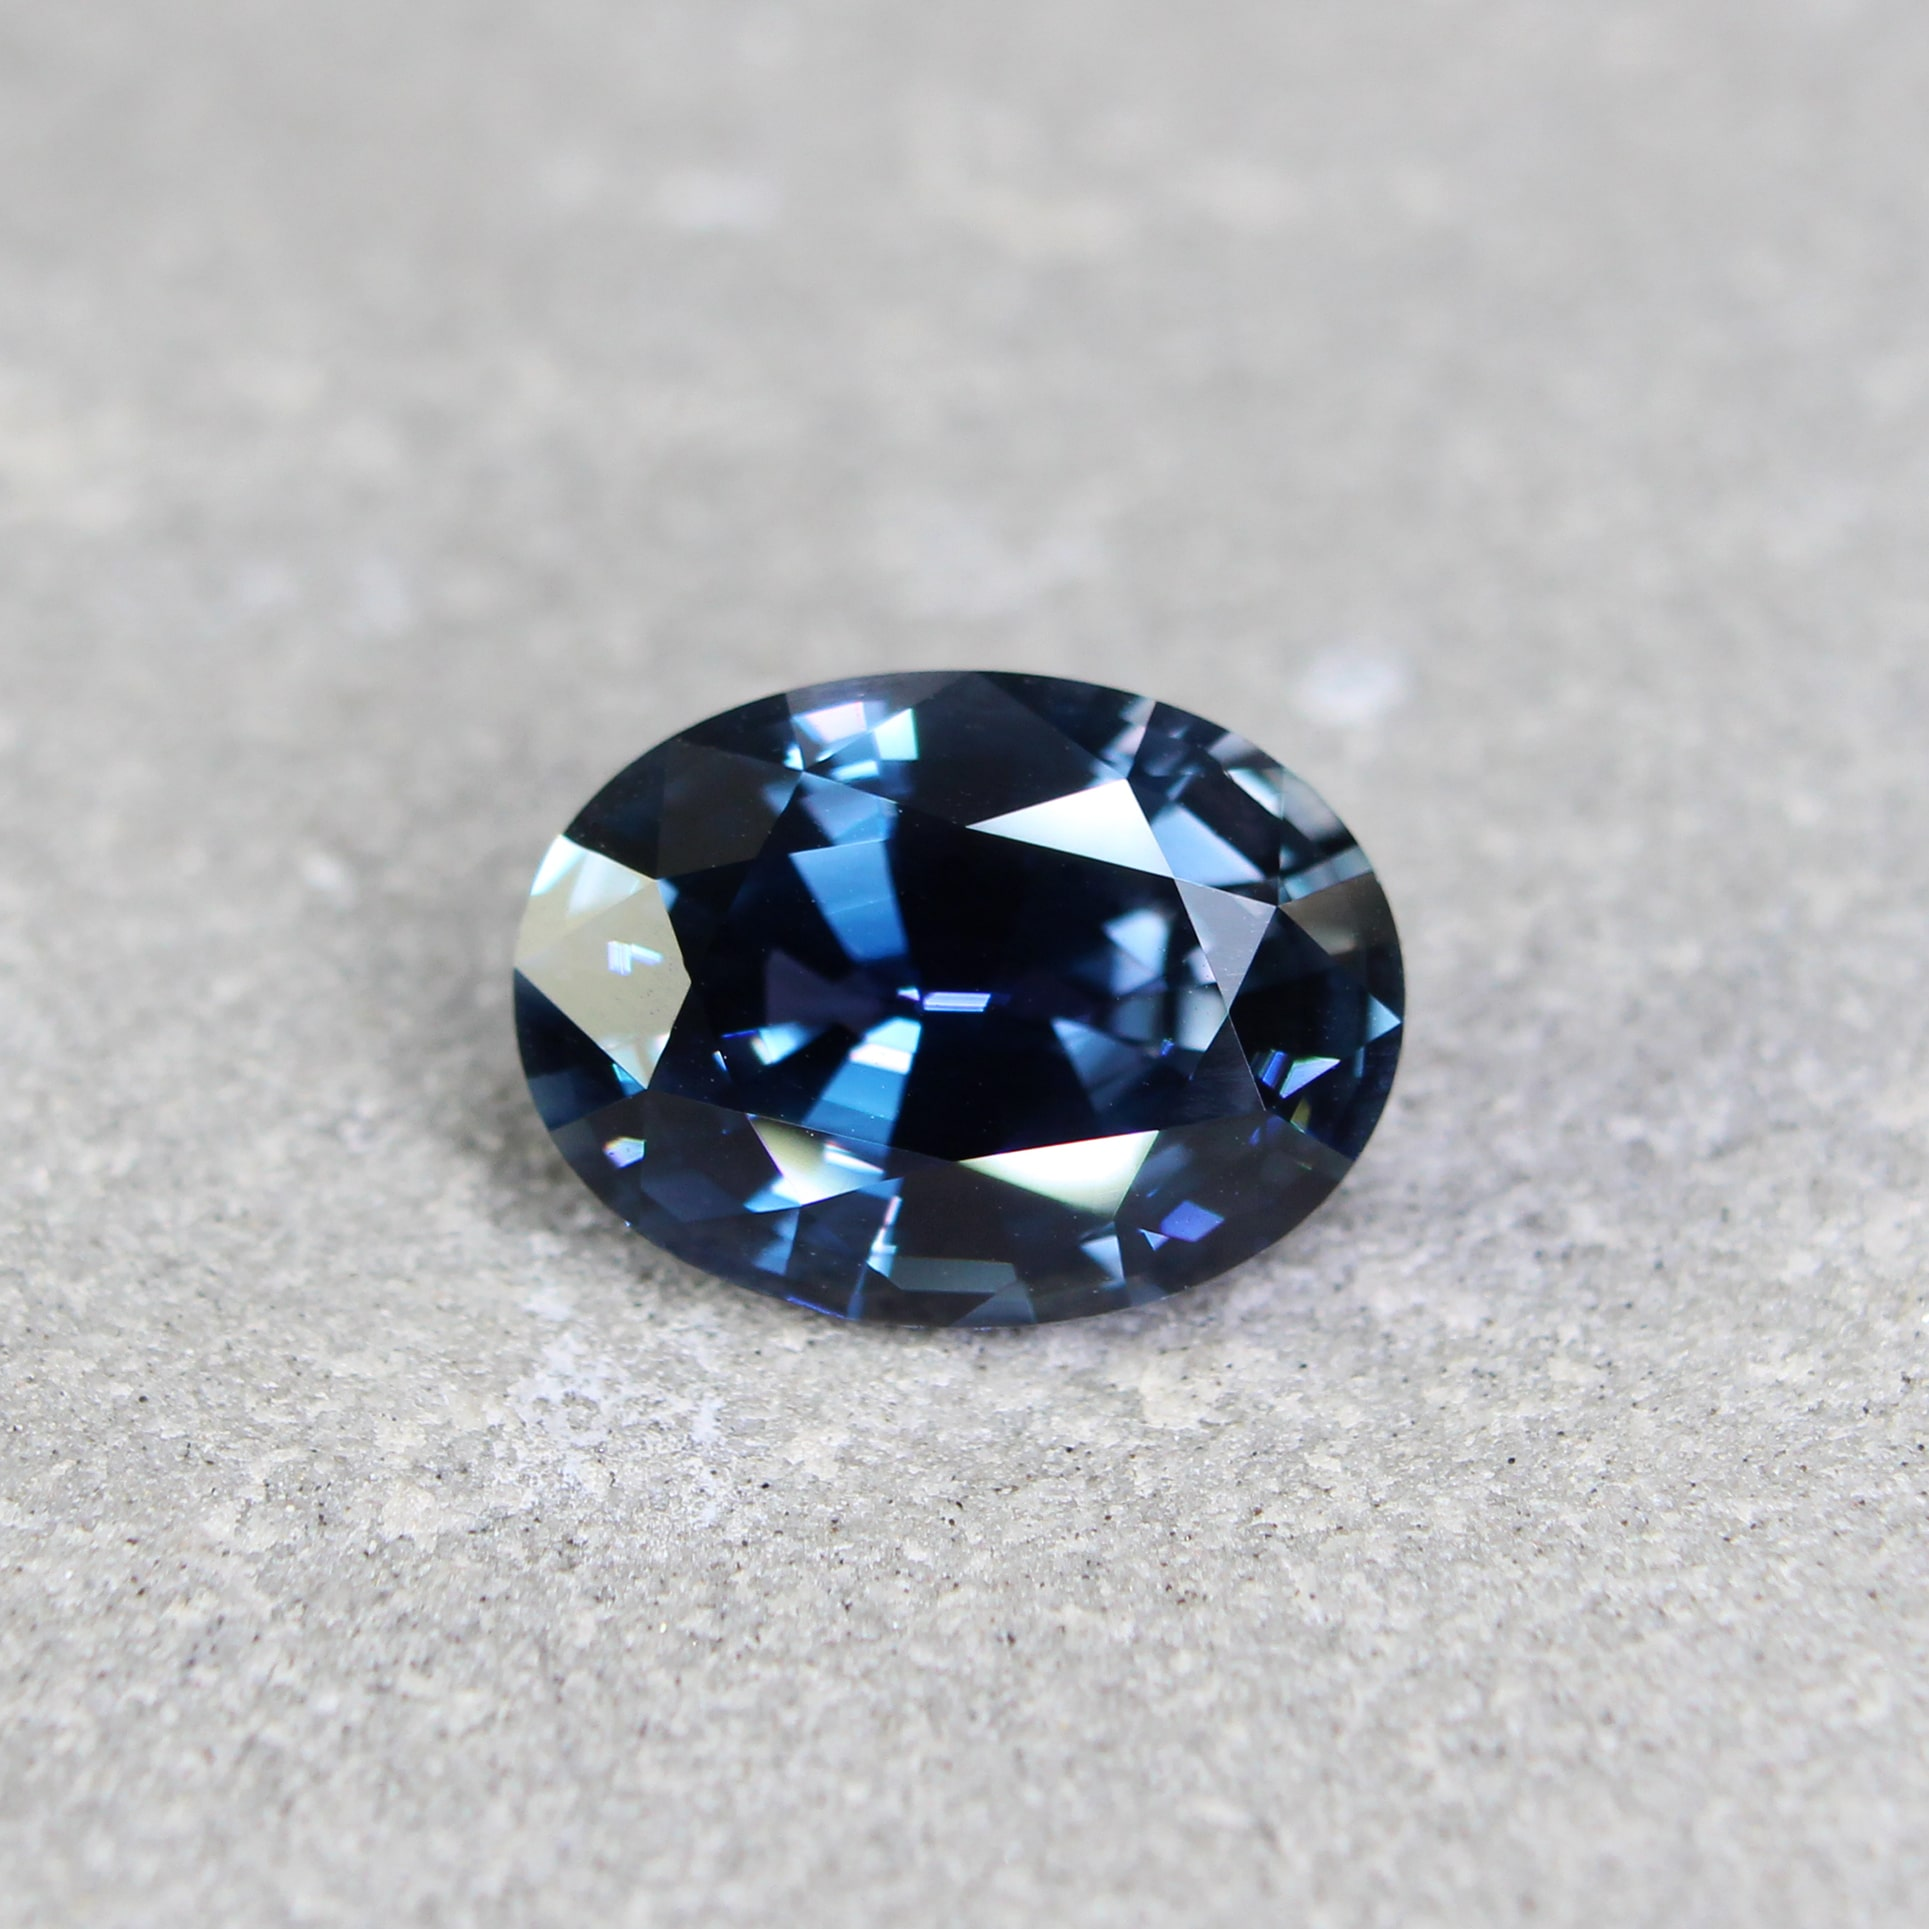 4.20 ct blue oval sapphire